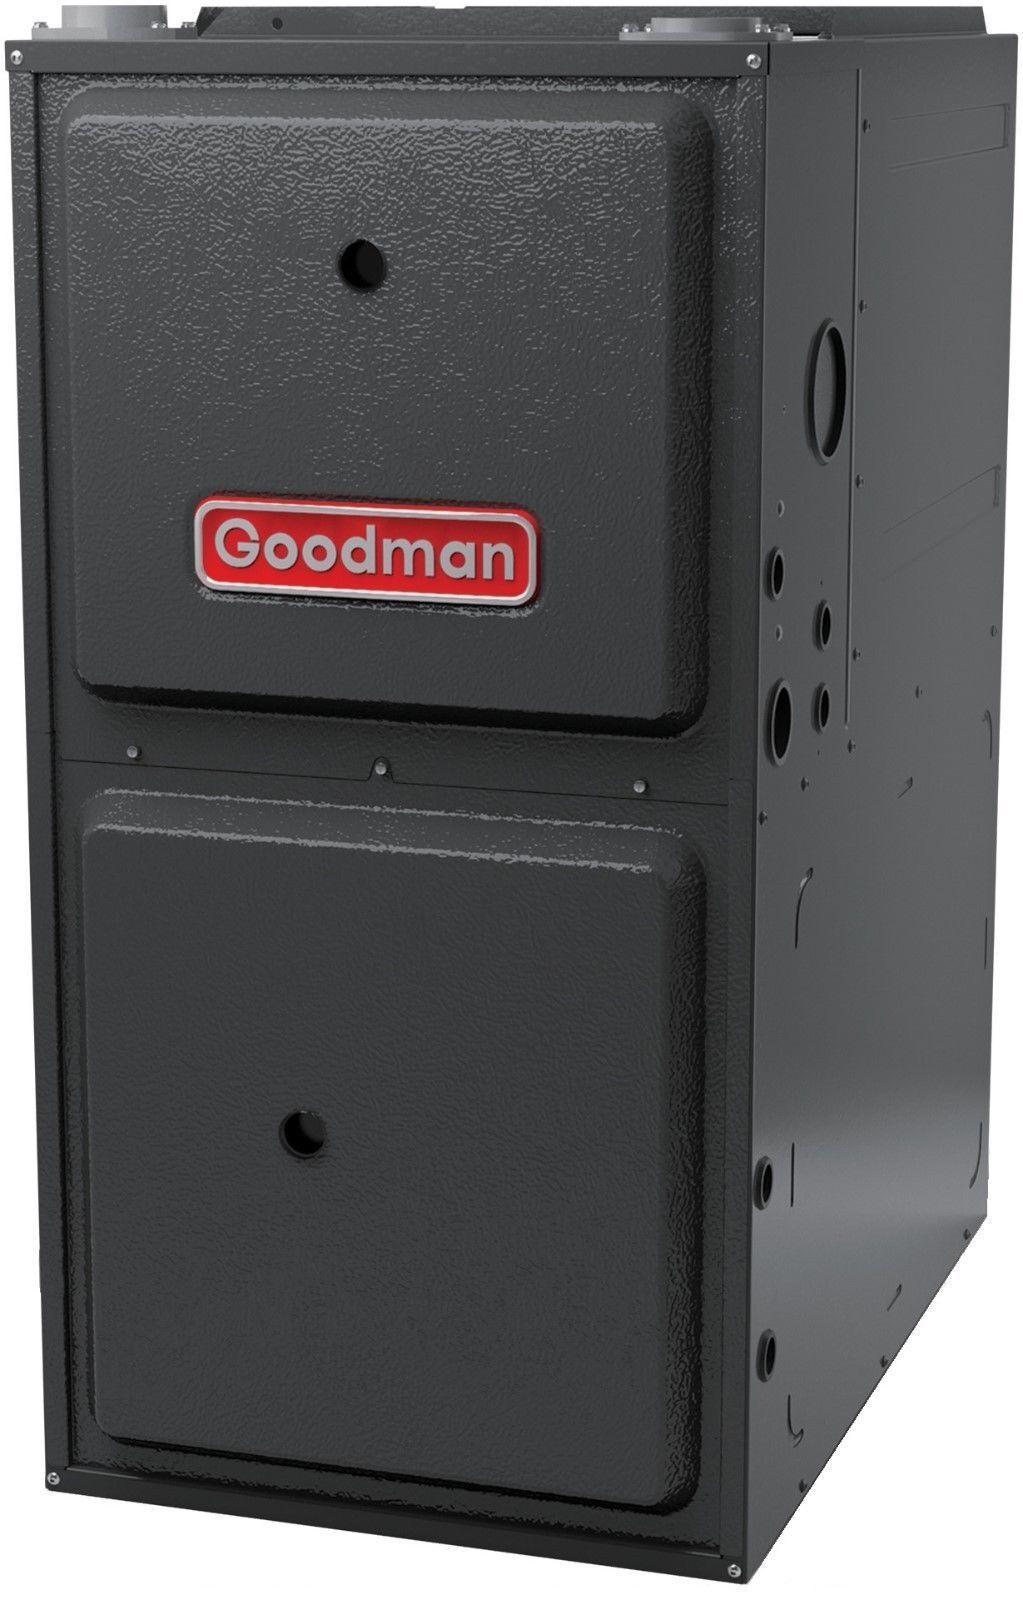 Goodman 100,000 BTU One Stage 92% Upflow Horizontal Gas Furn